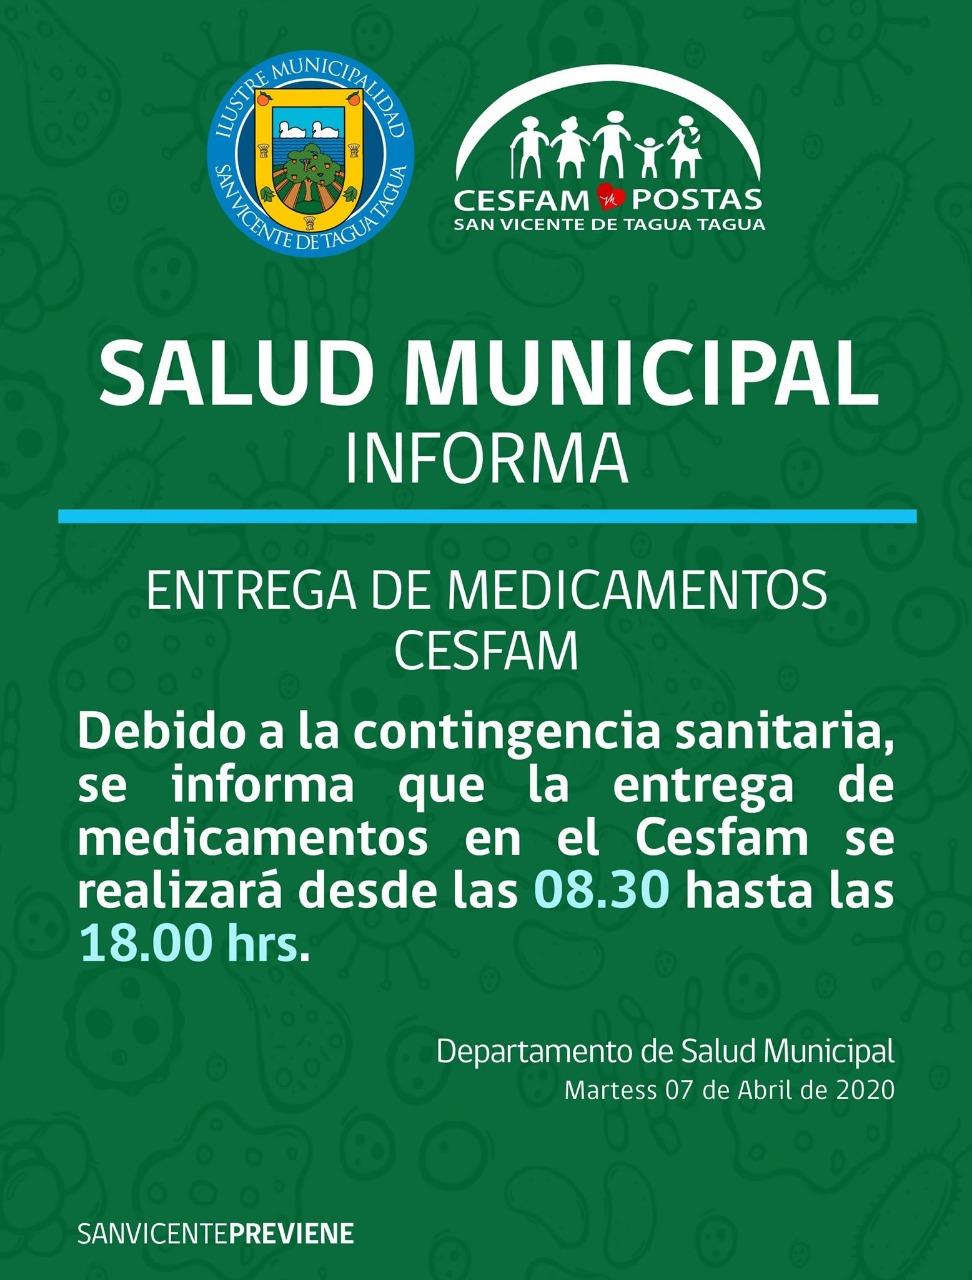 SALUD MUNICIPAL INFORMA | ENTREGA DE MEDICAMENTOS CESFAM